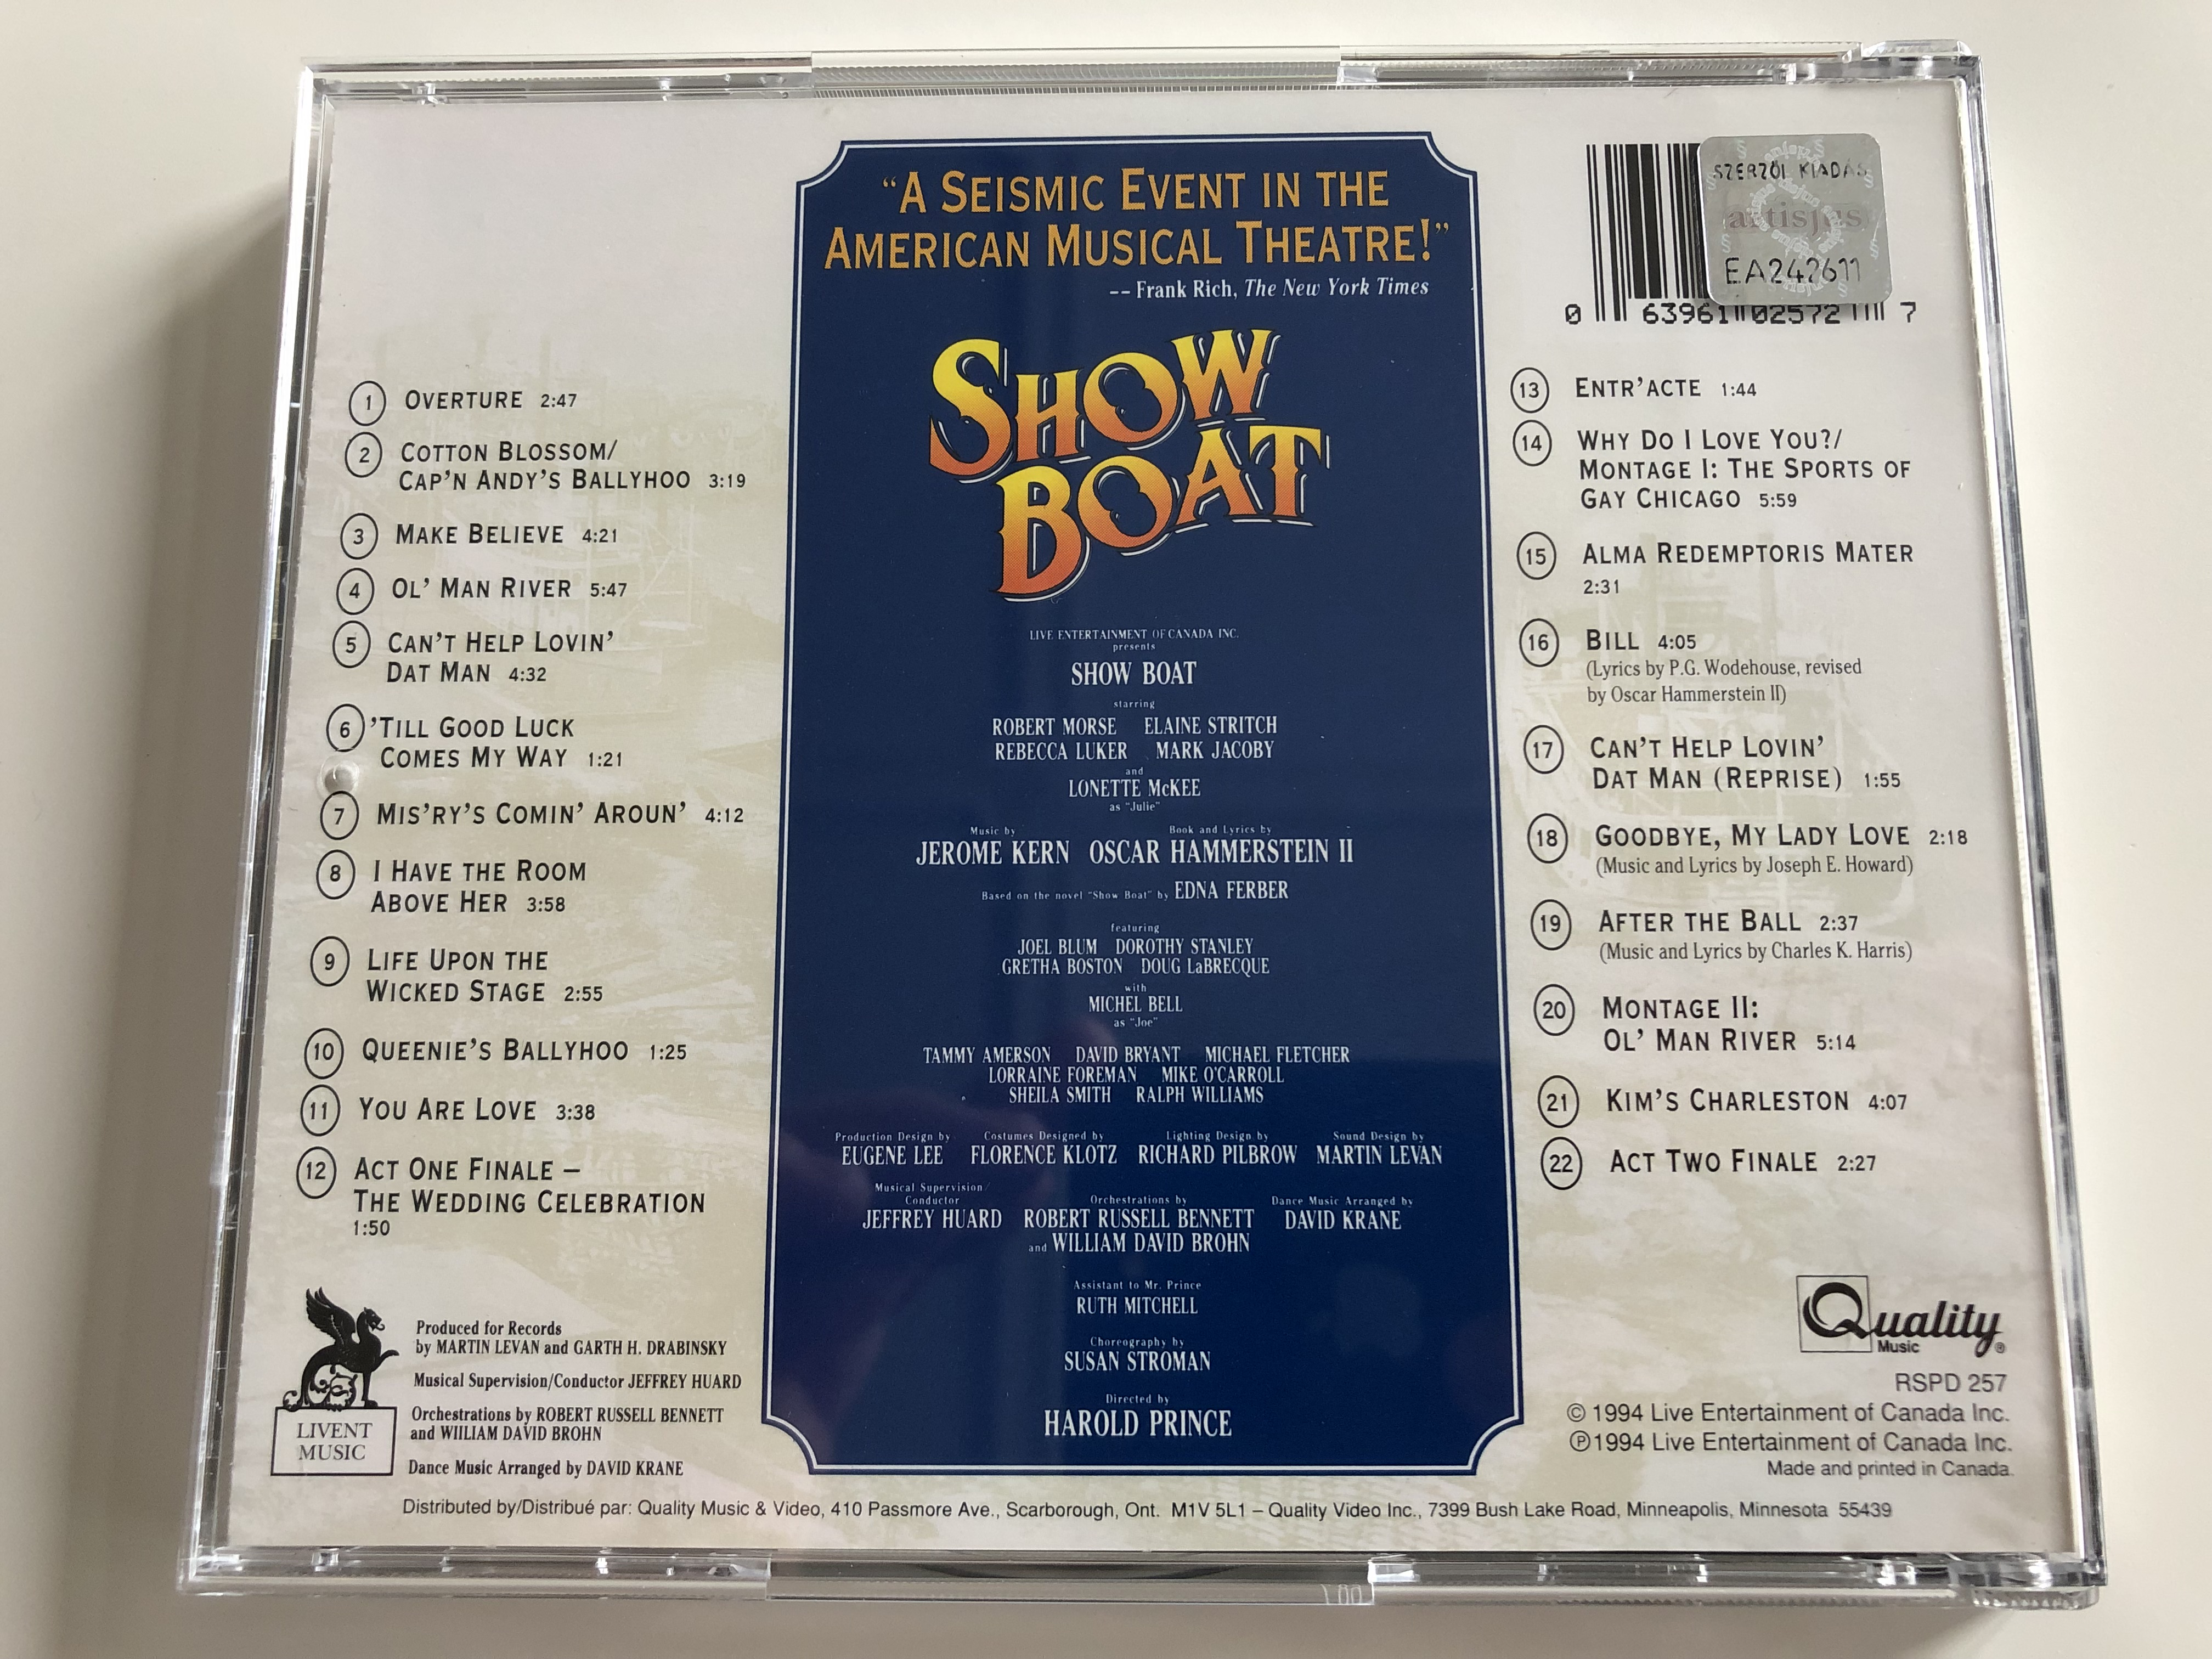 show-boat-jerome-kern-oscar-hammerstein-ii-edna-ferber-susan-stroman-harold-prince-quality-music-audio-cd-1994-rspd-257-3-.jpg